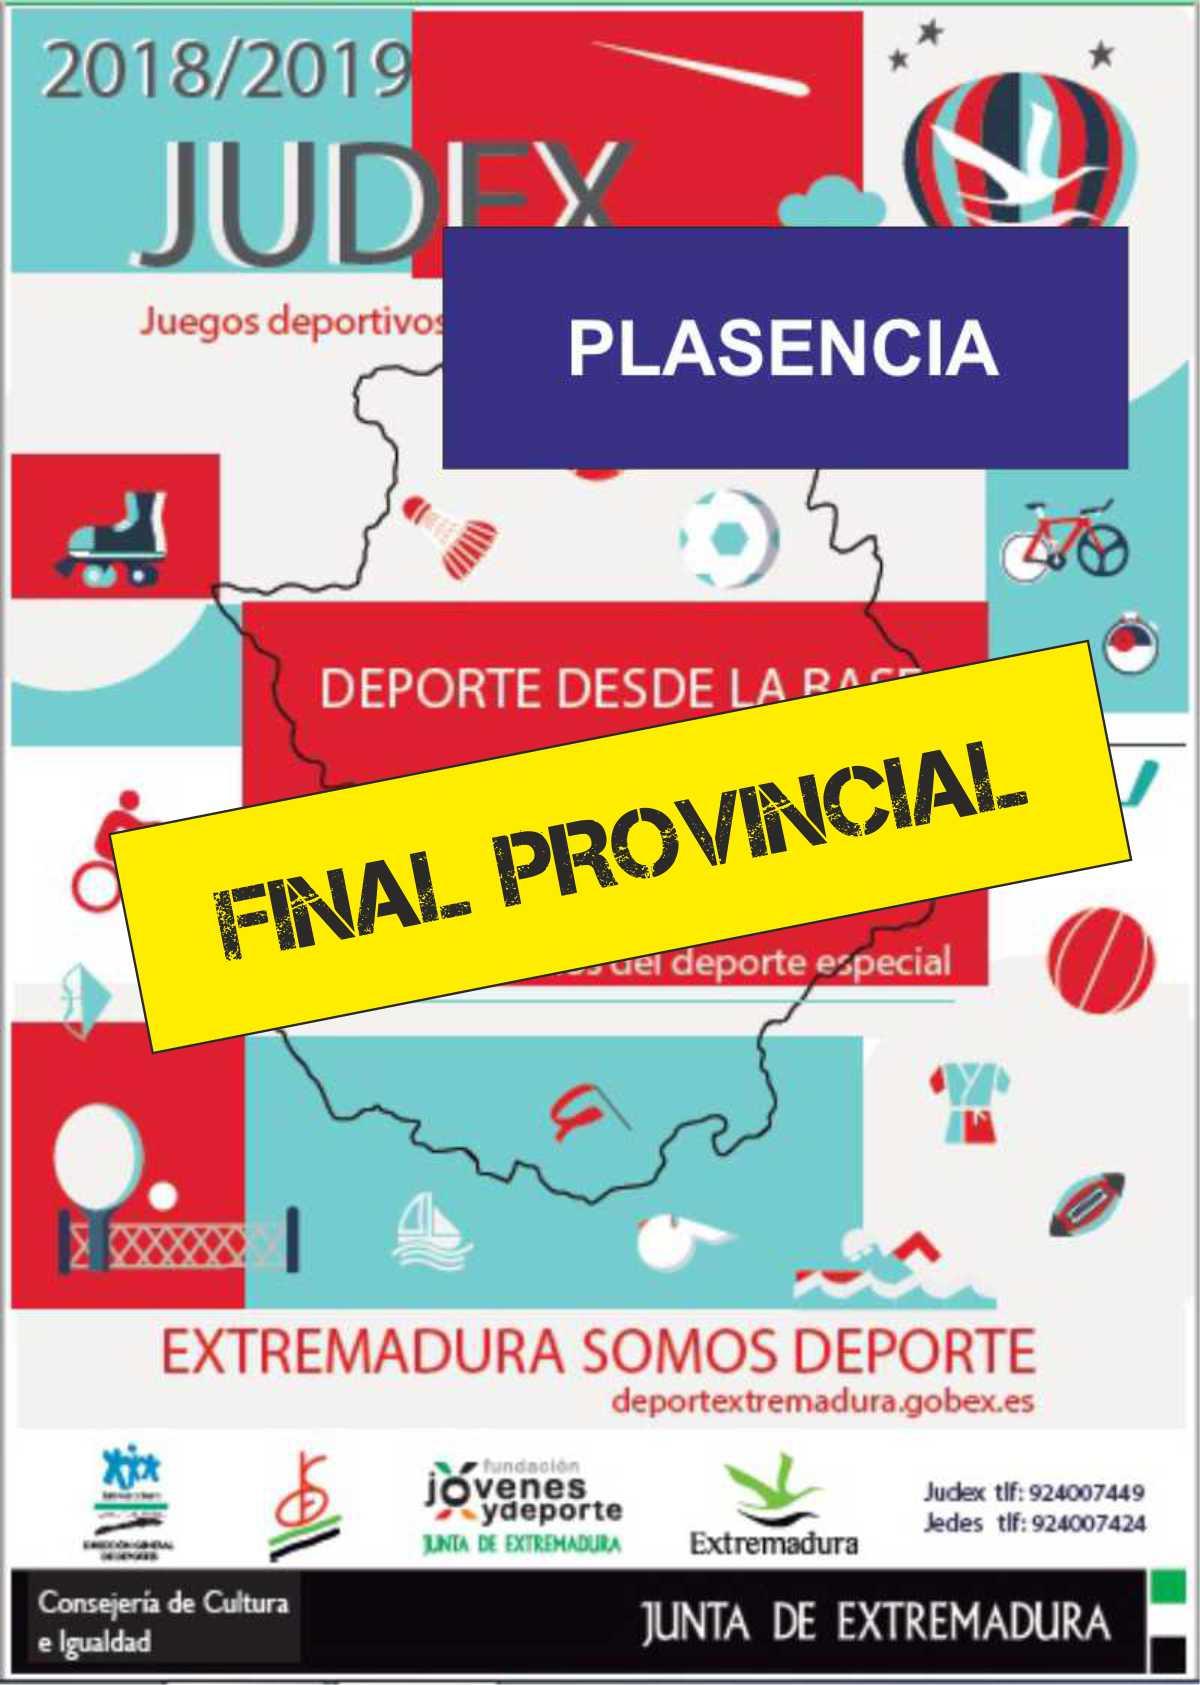 JUDEX Final provincial 2019 Plasencia